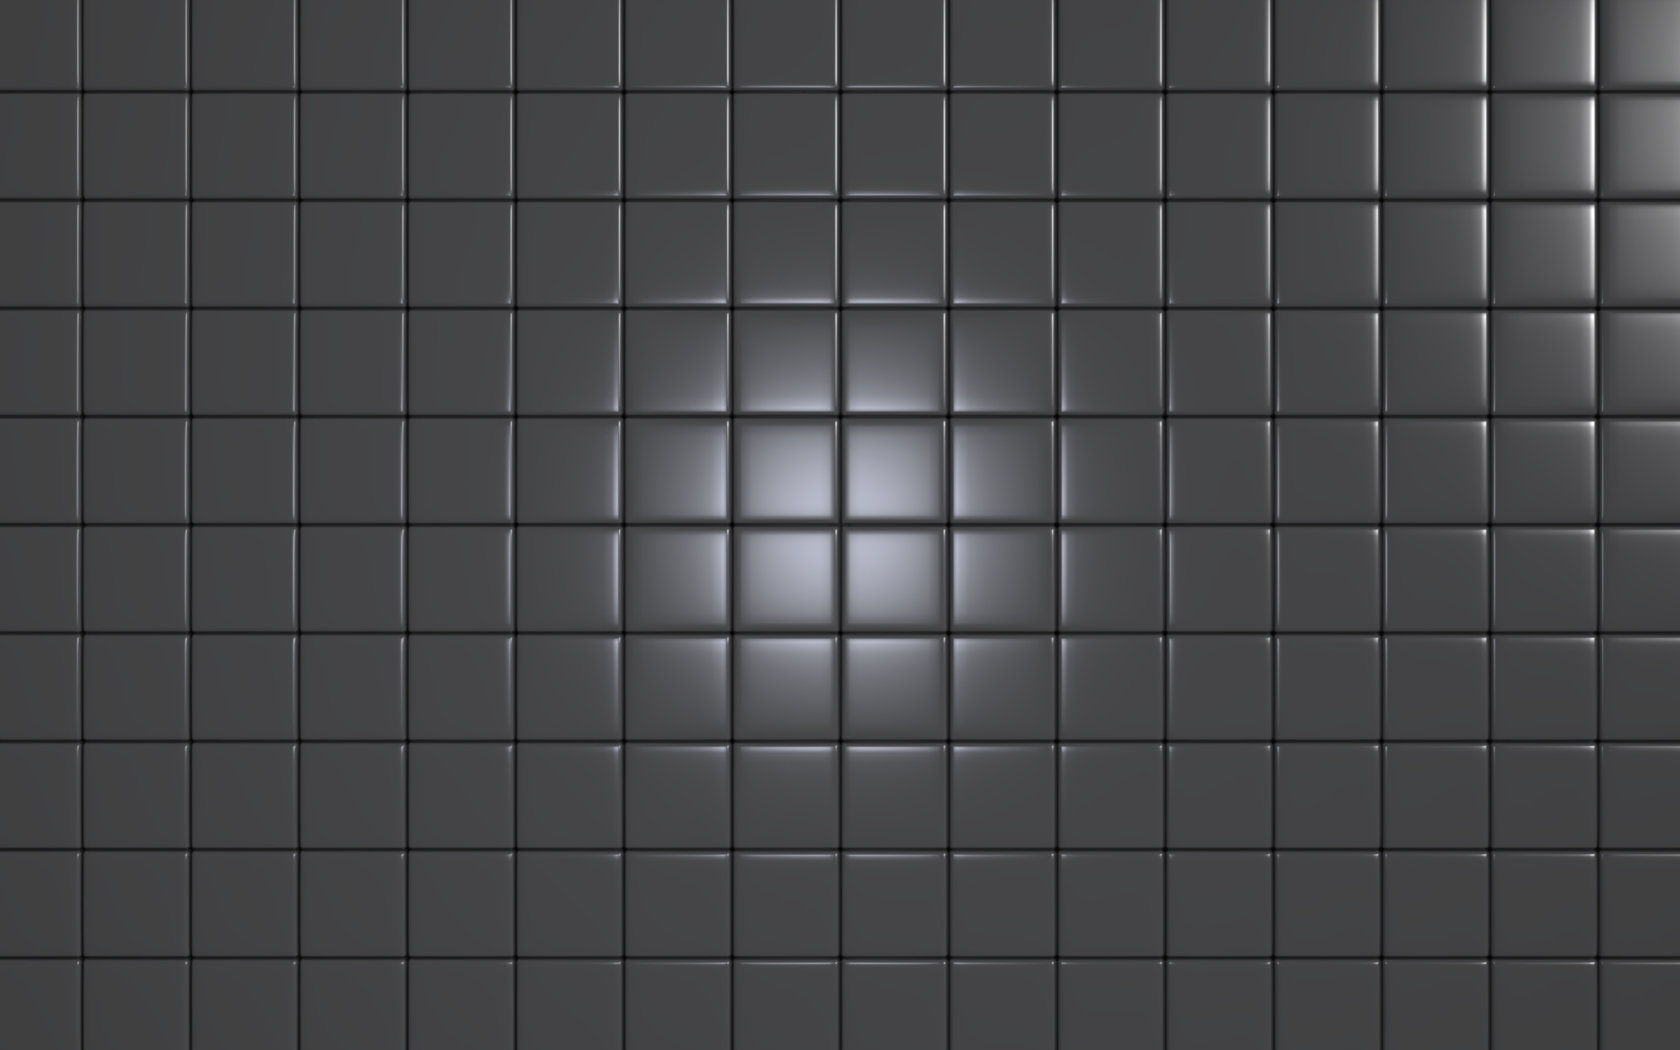 Mosaic wallpaper tiles wallpapersafari for Tiling on a roll kitchen wallpaper